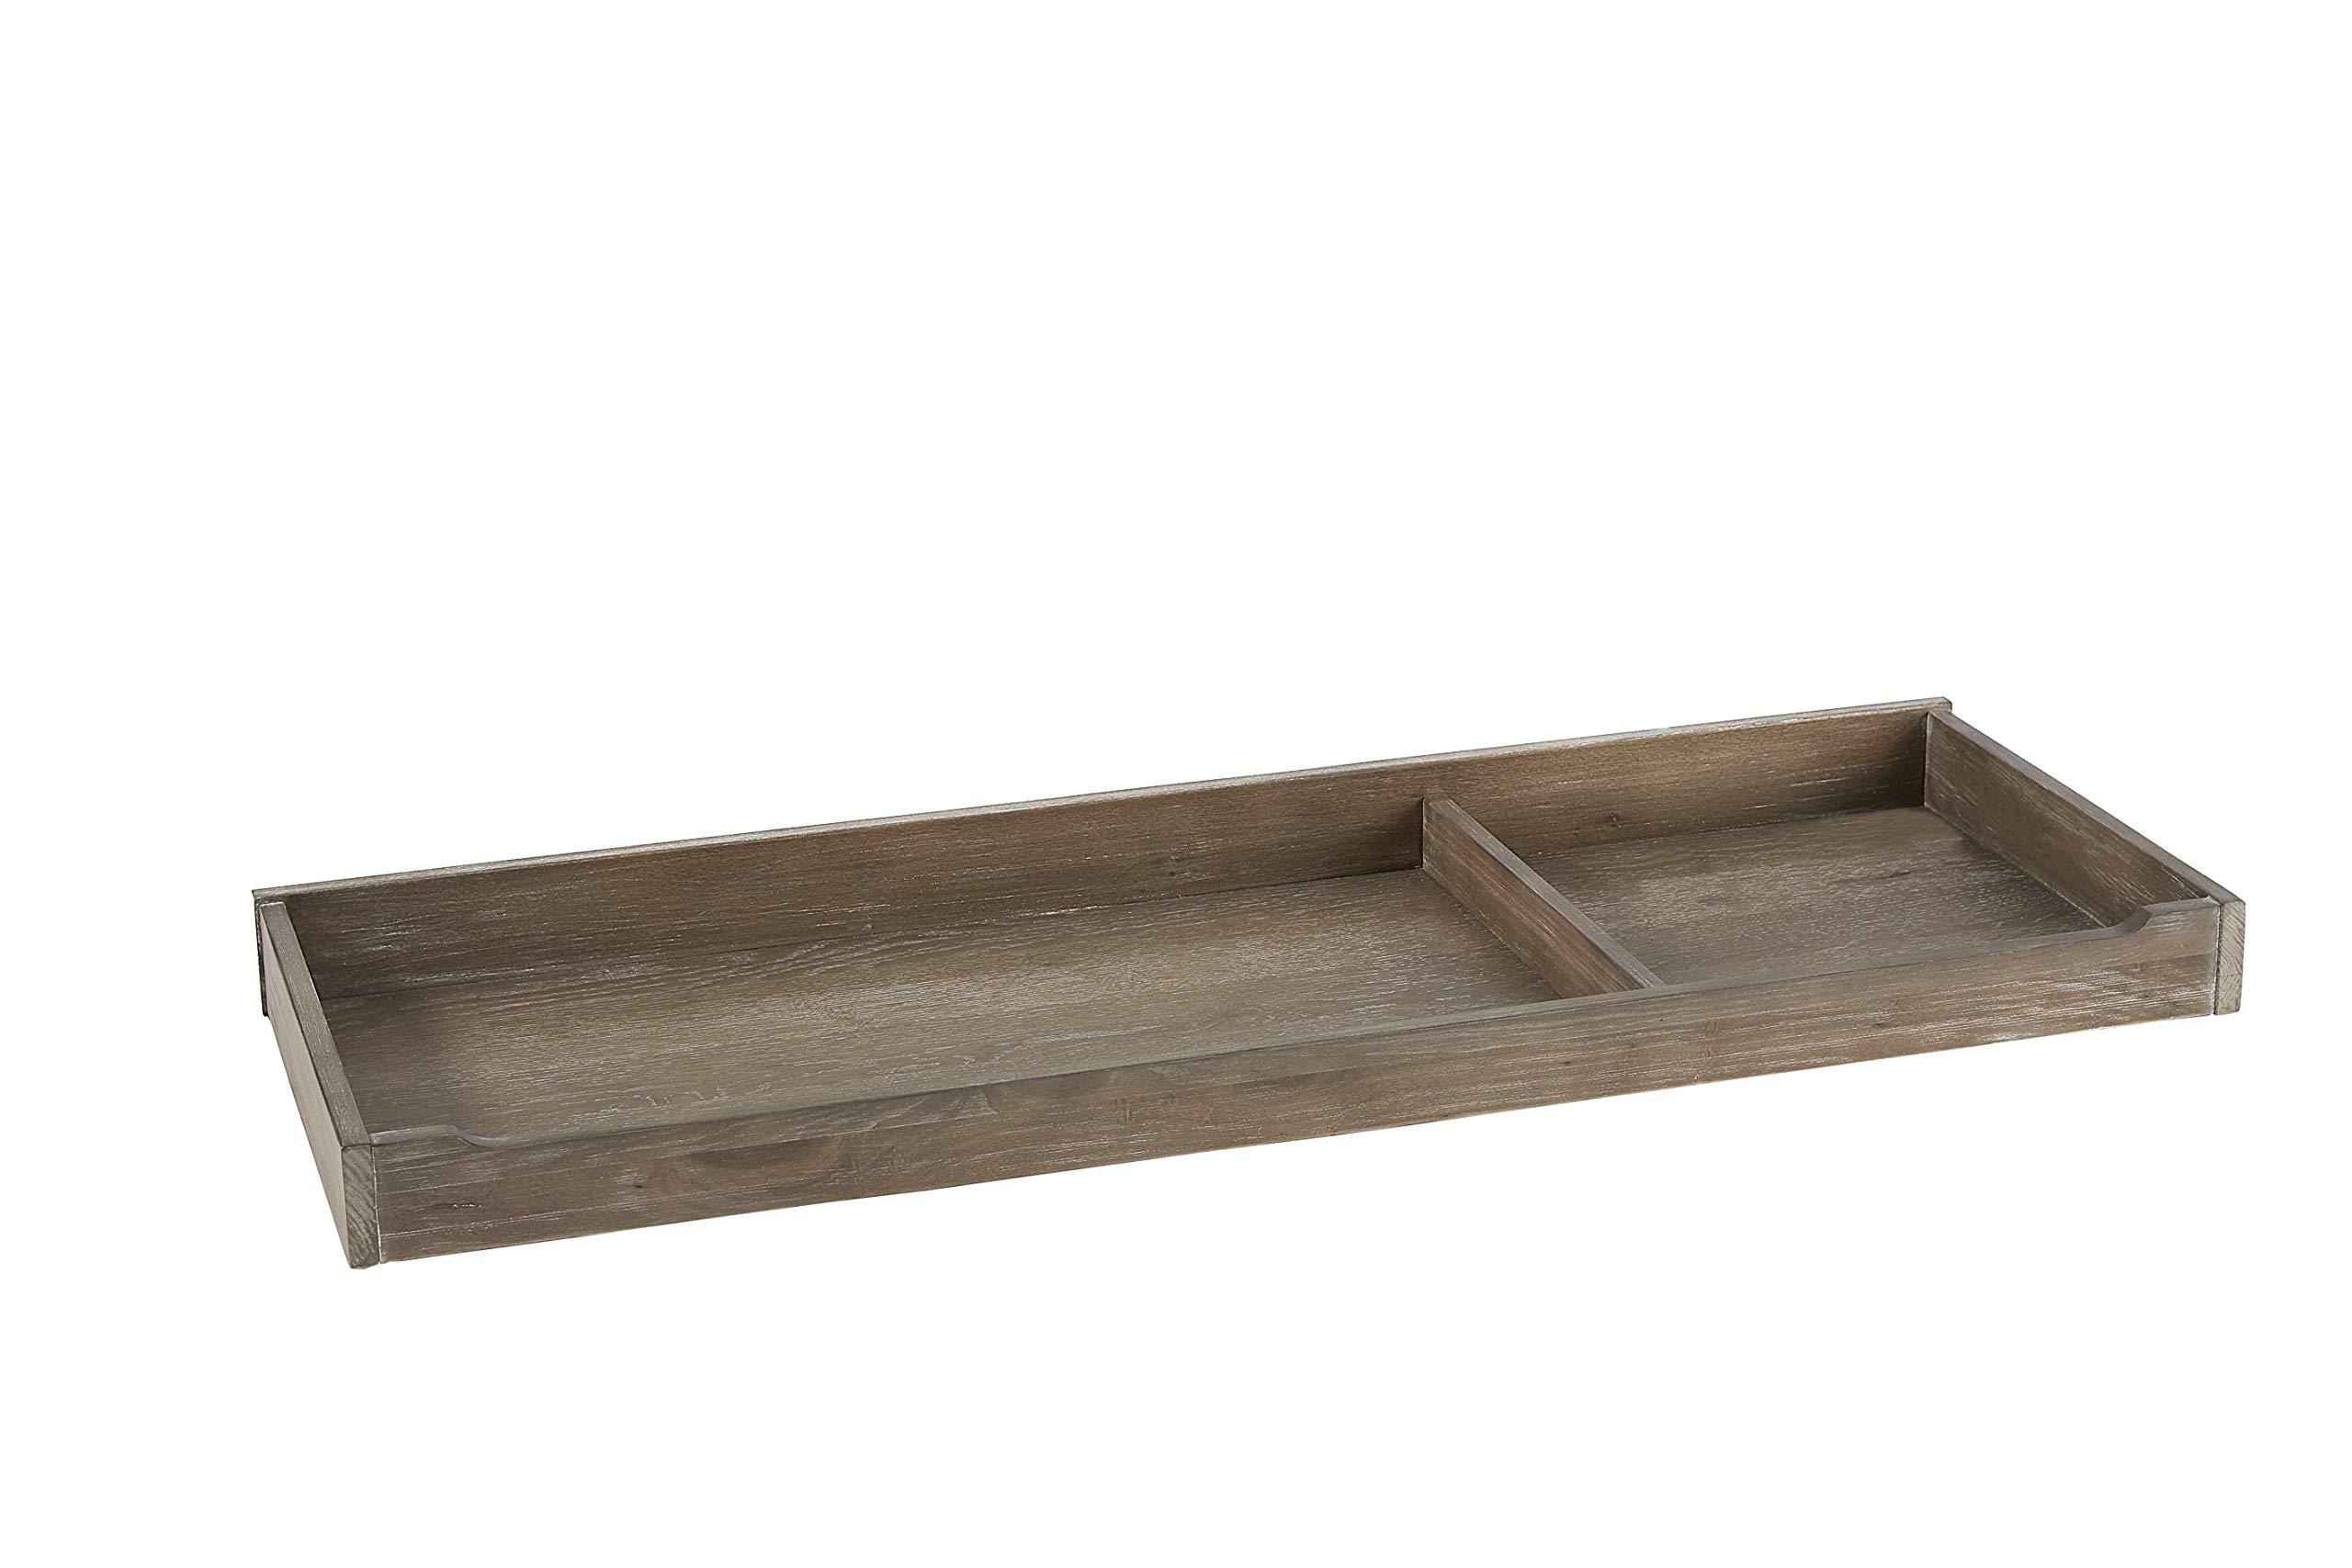 Westwood Design Leland Changer Top kit, Stone Washed by Westwood Design